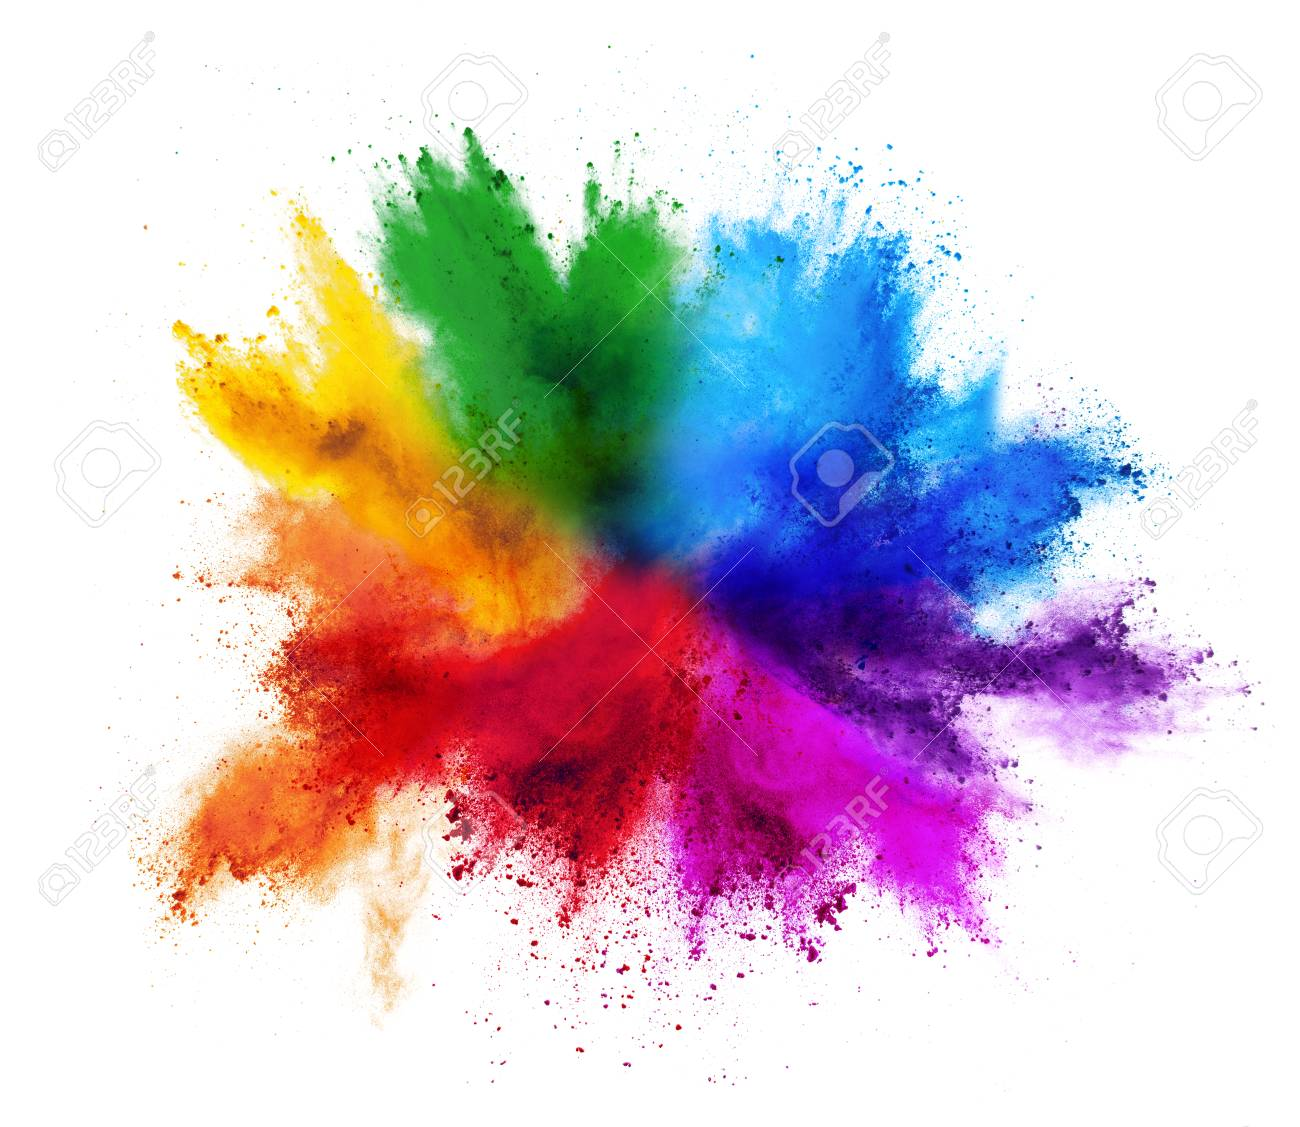 colorful rainbow holi paint color powder explosion isolated on white background - 121537050